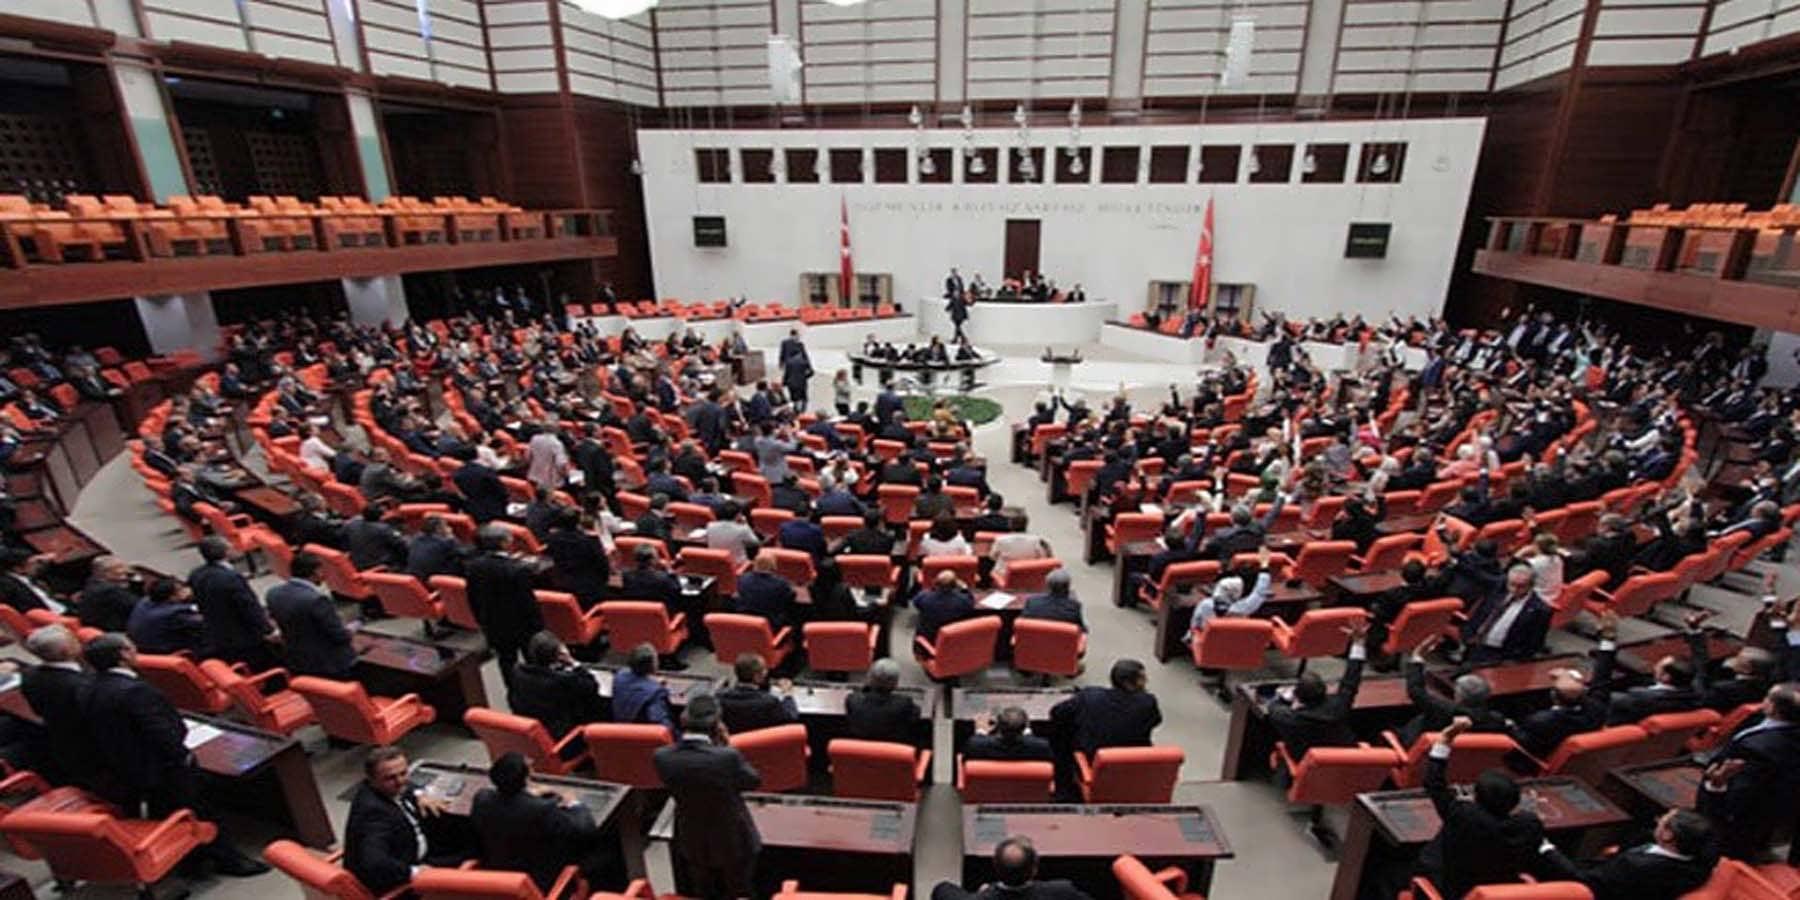 Taşeron İçin 20 Milletvekili Harekete Geçti